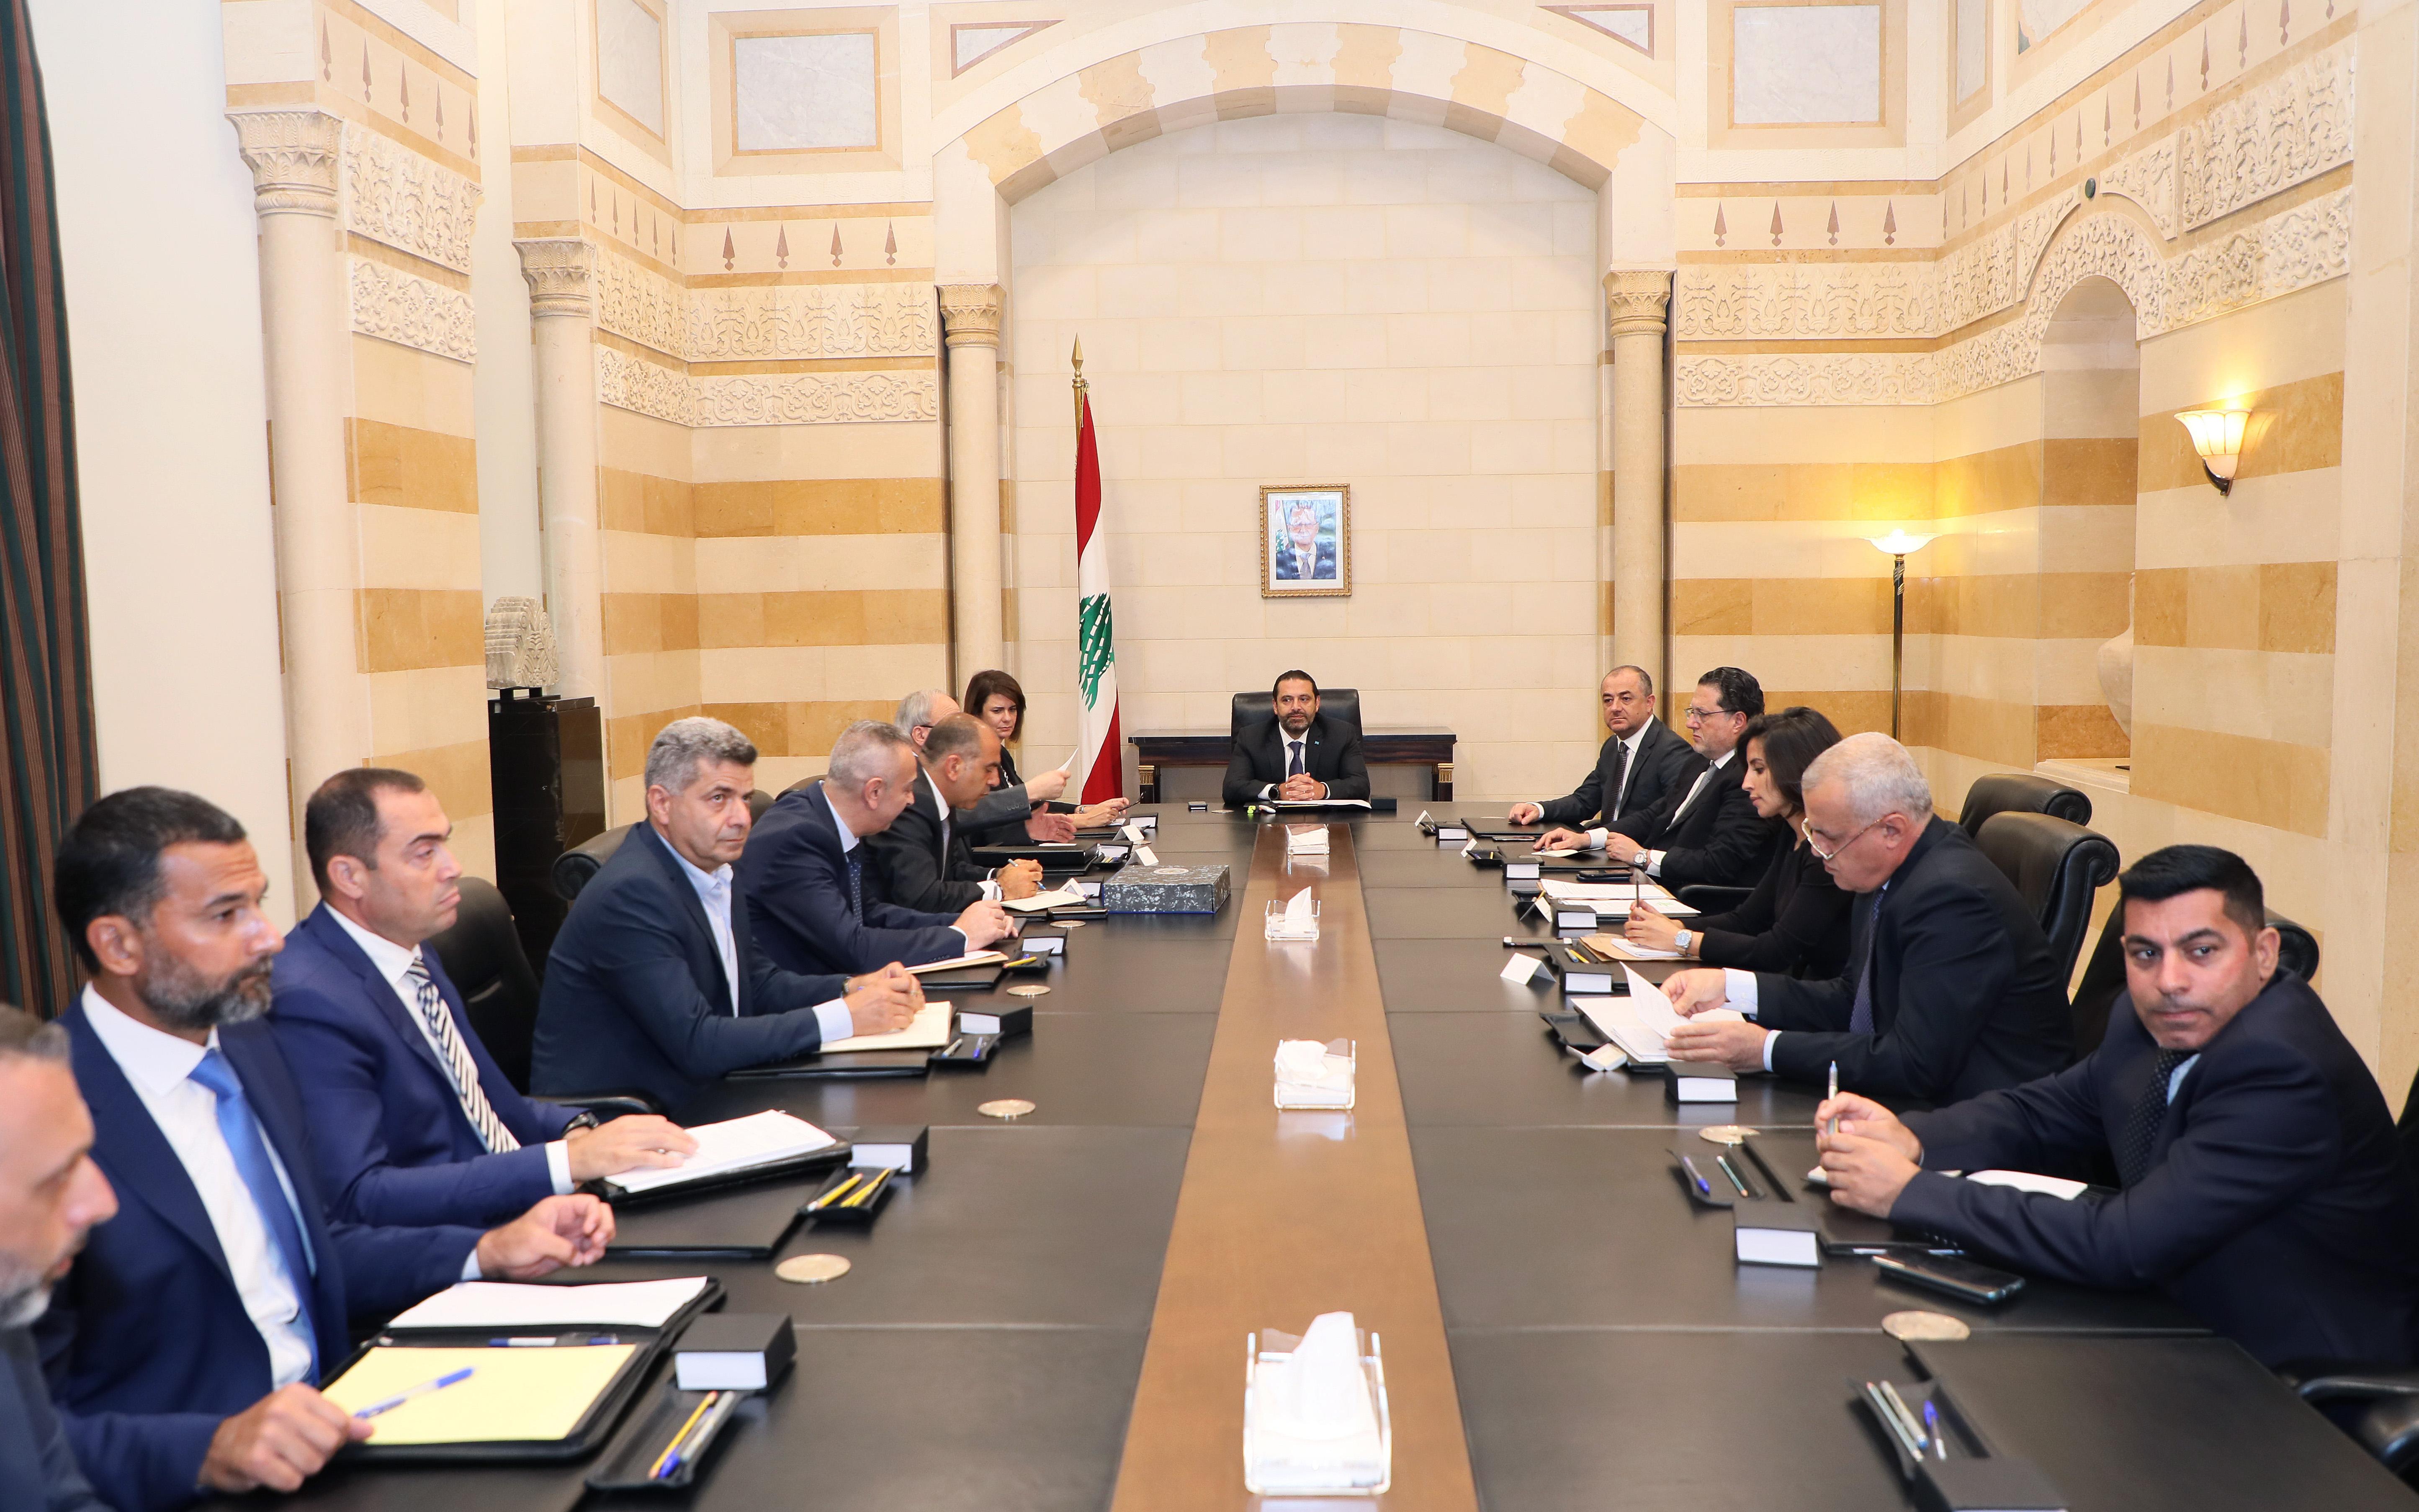 Pr Minister Saad Hariri Heading a Ministerial Council